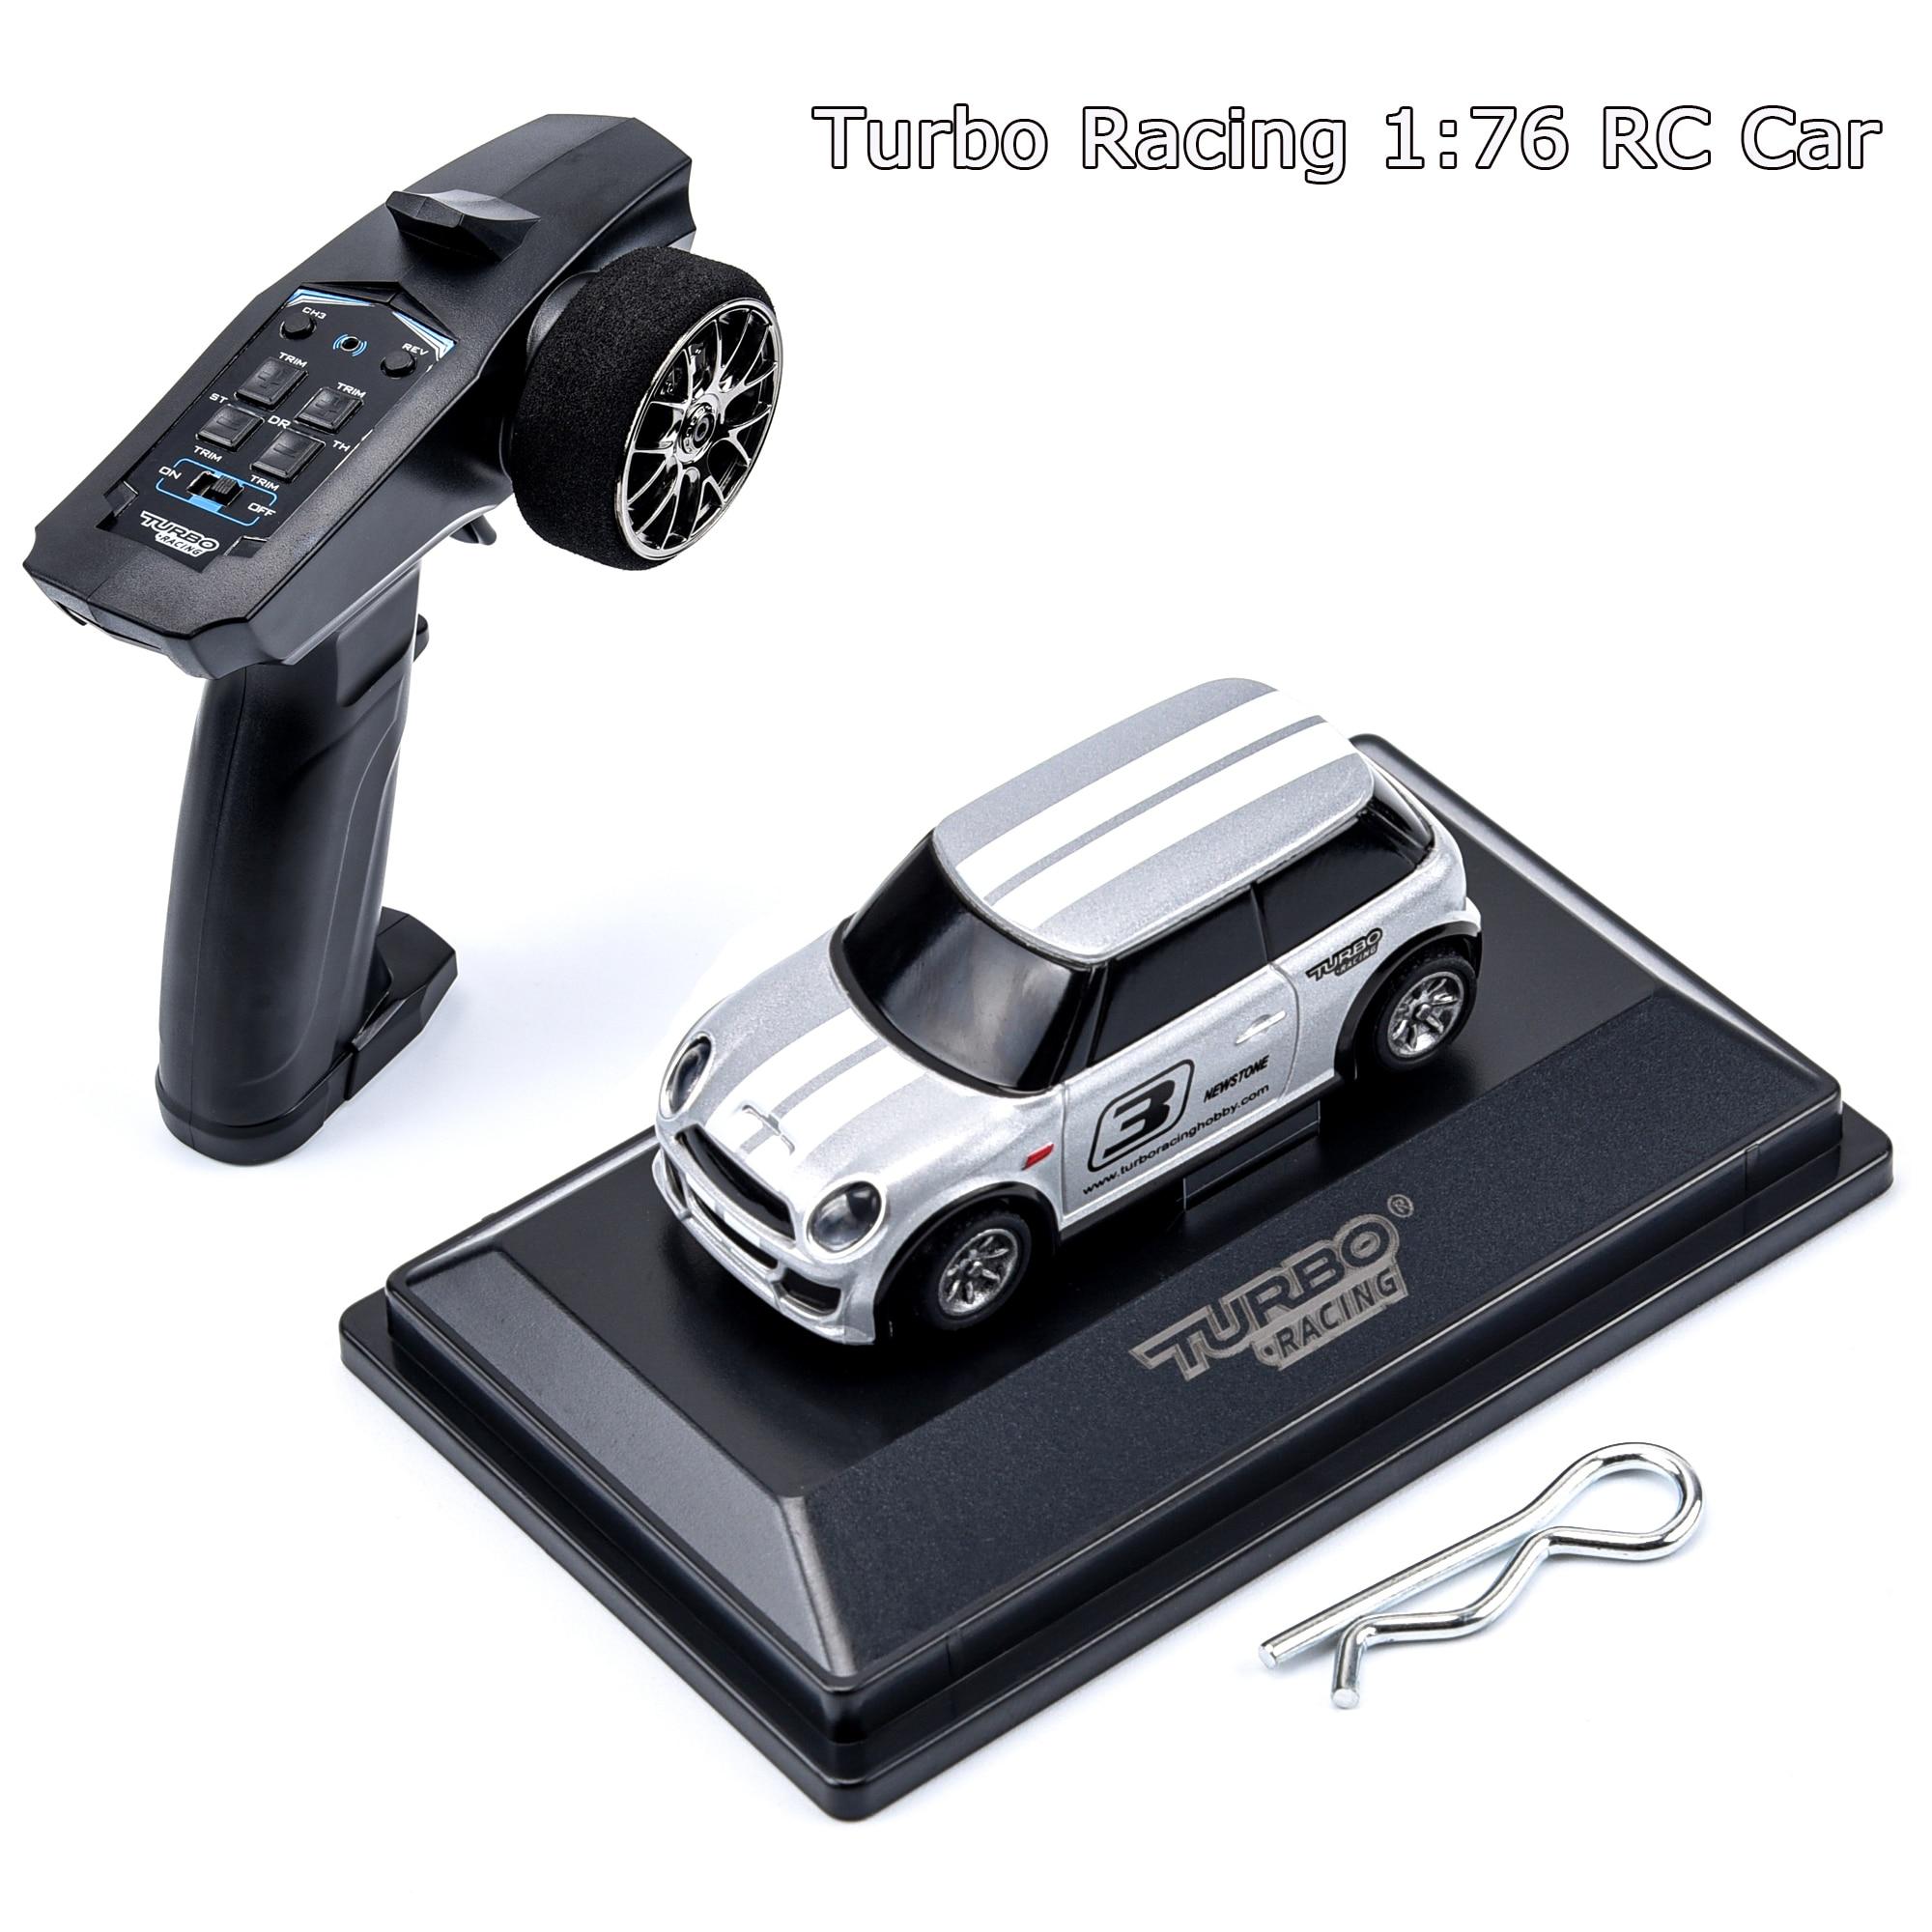 Turbo Racing 1:76 RC Car Mini Full Proportional Electric Race RTR Car Kit 2.4GHZ Racing Experience C